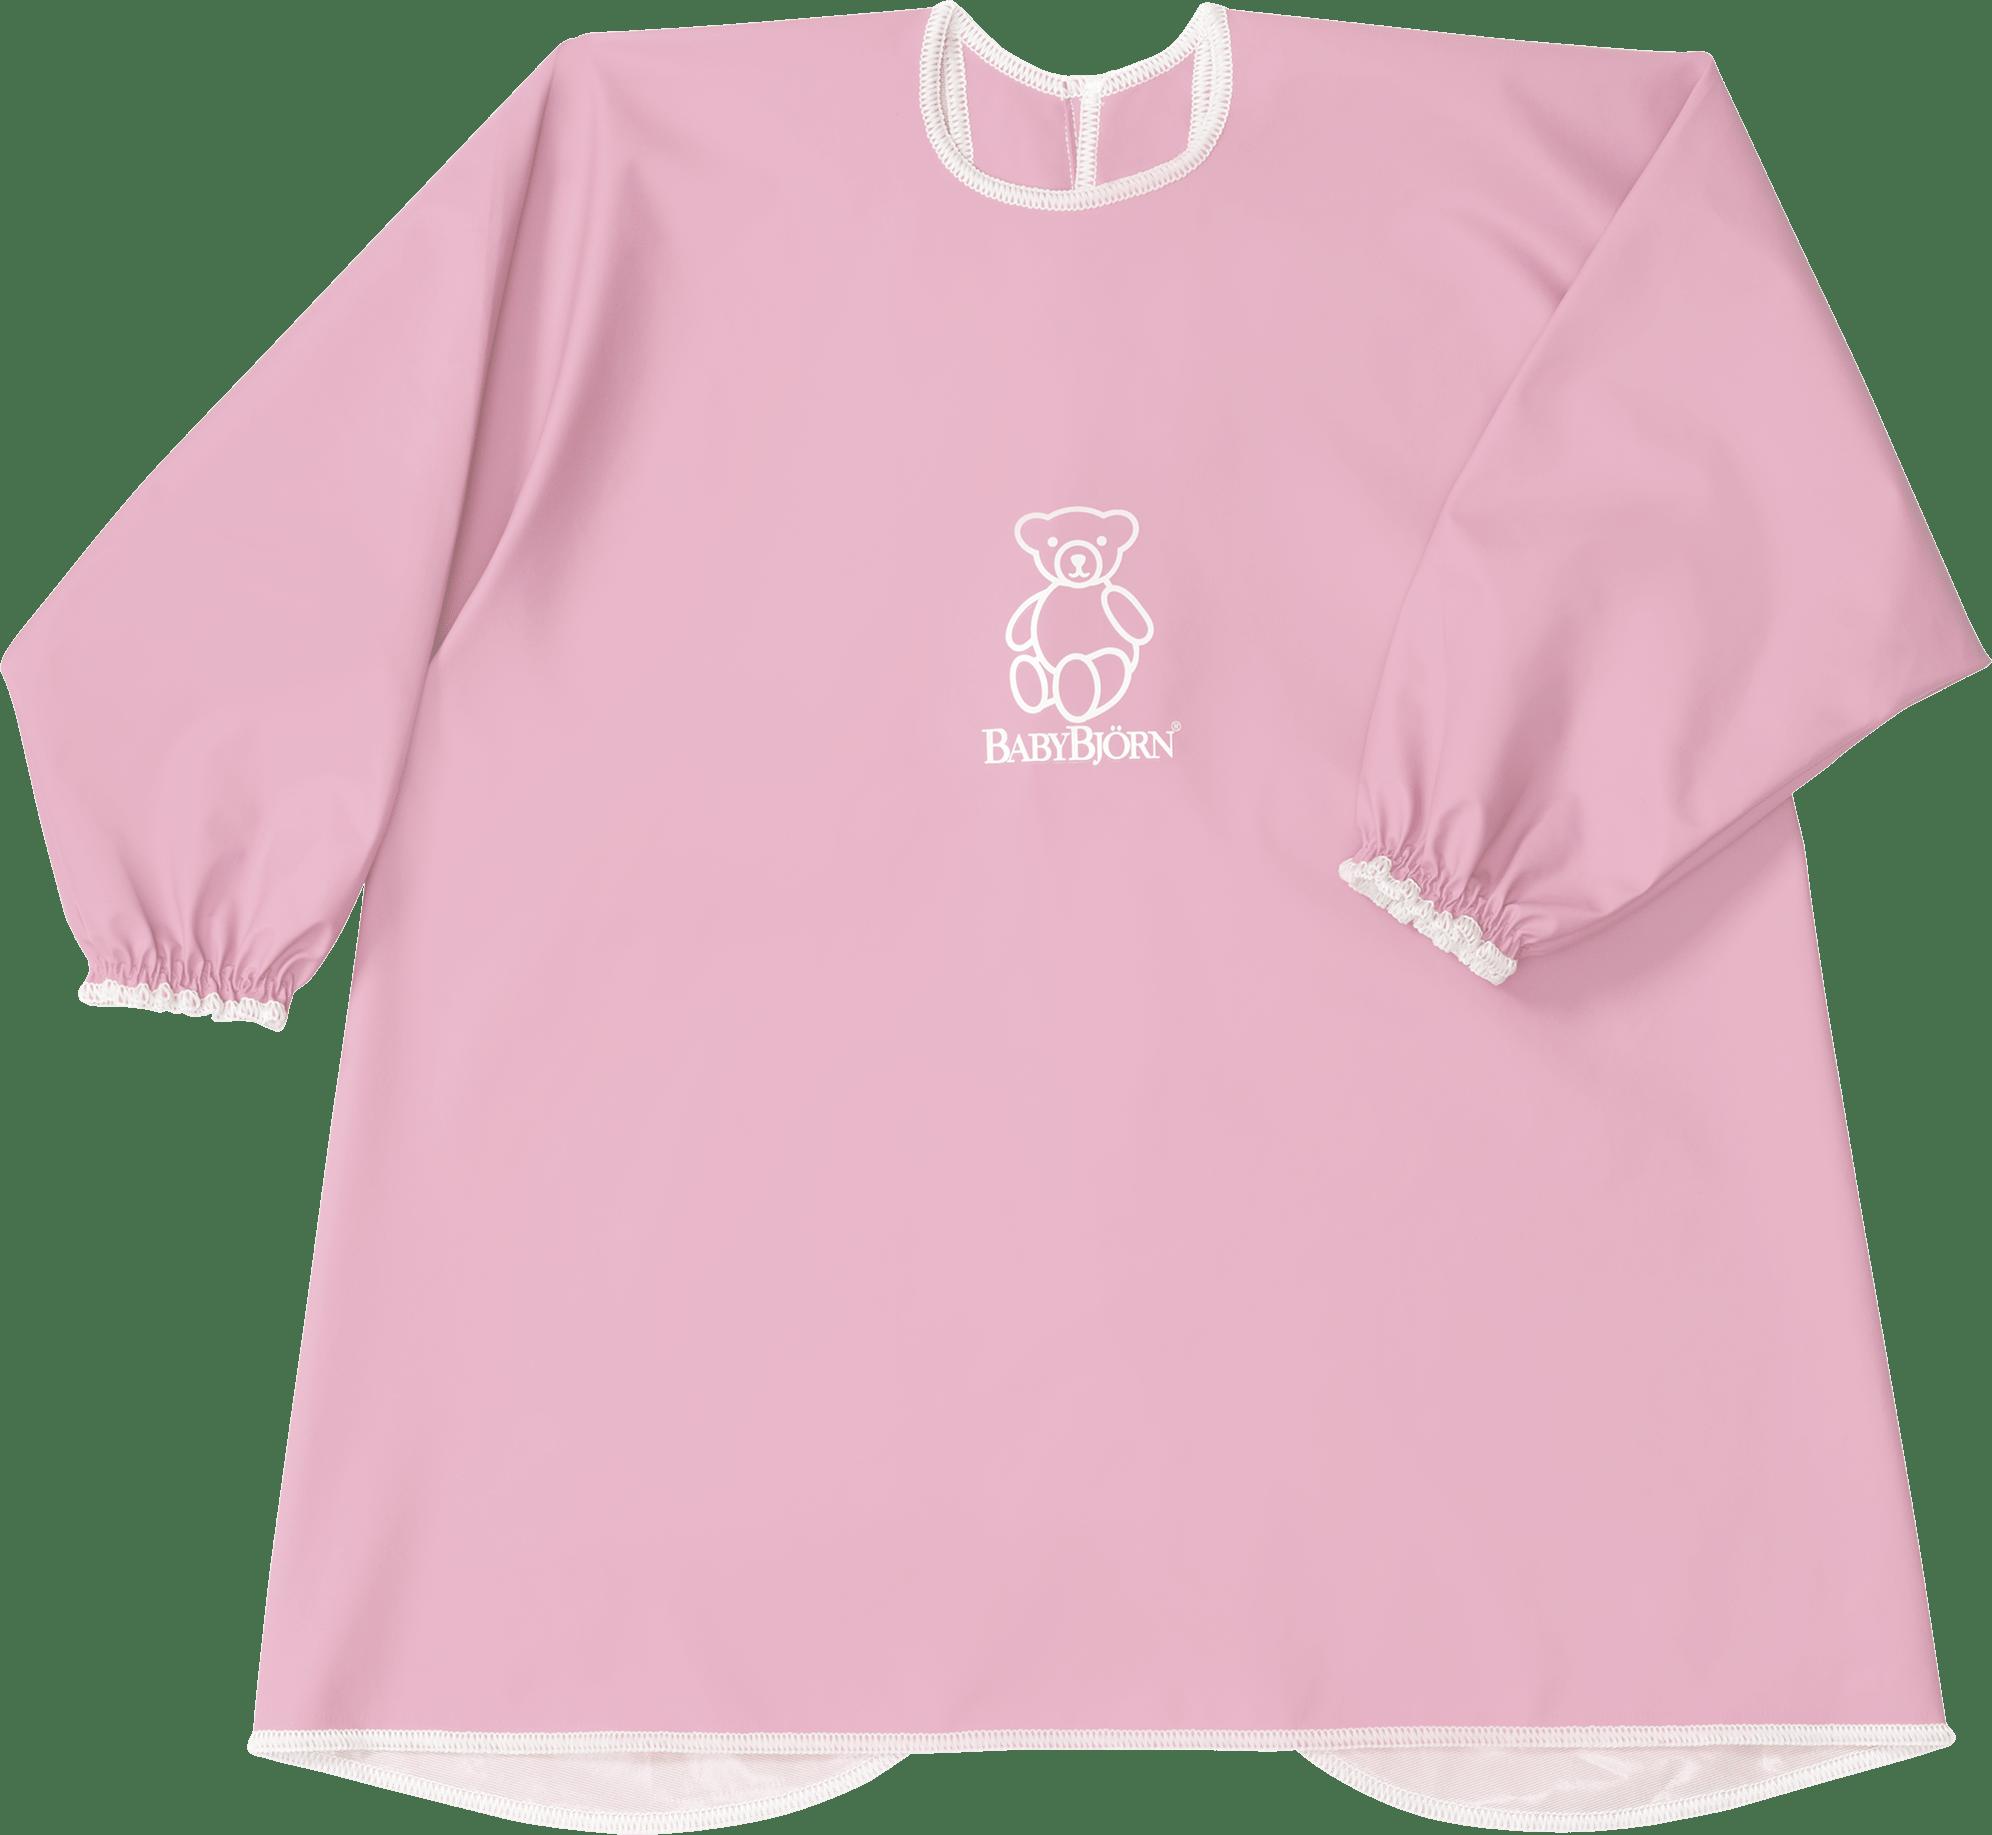 BABYBJÖRN Barnförkläde